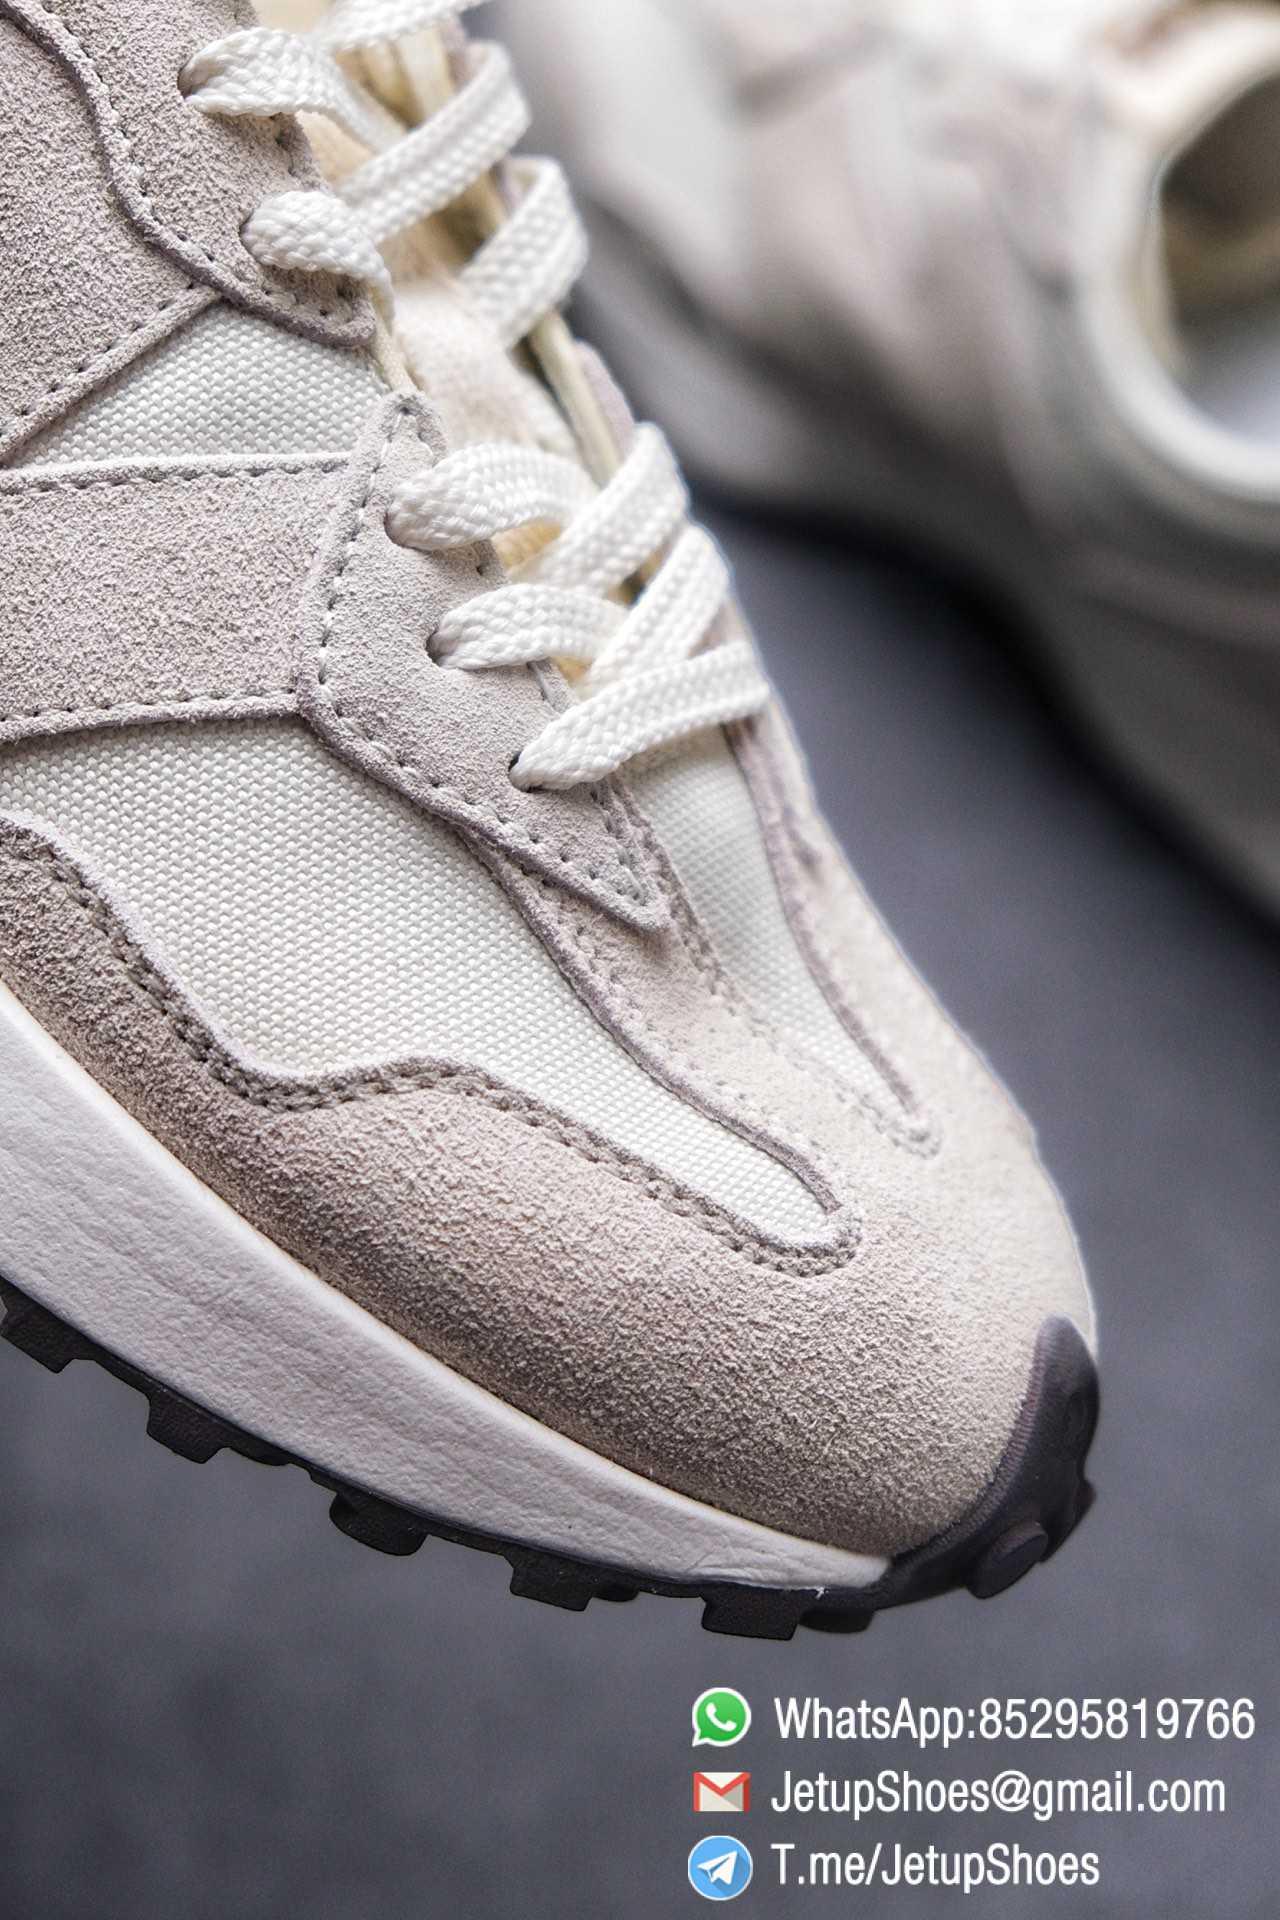 Replica Sneakers New Balance 327 Noritake x 327 Light Grey White Mesh Quarter Suede Upper Retro Running Shoes SKU WS327FB 05